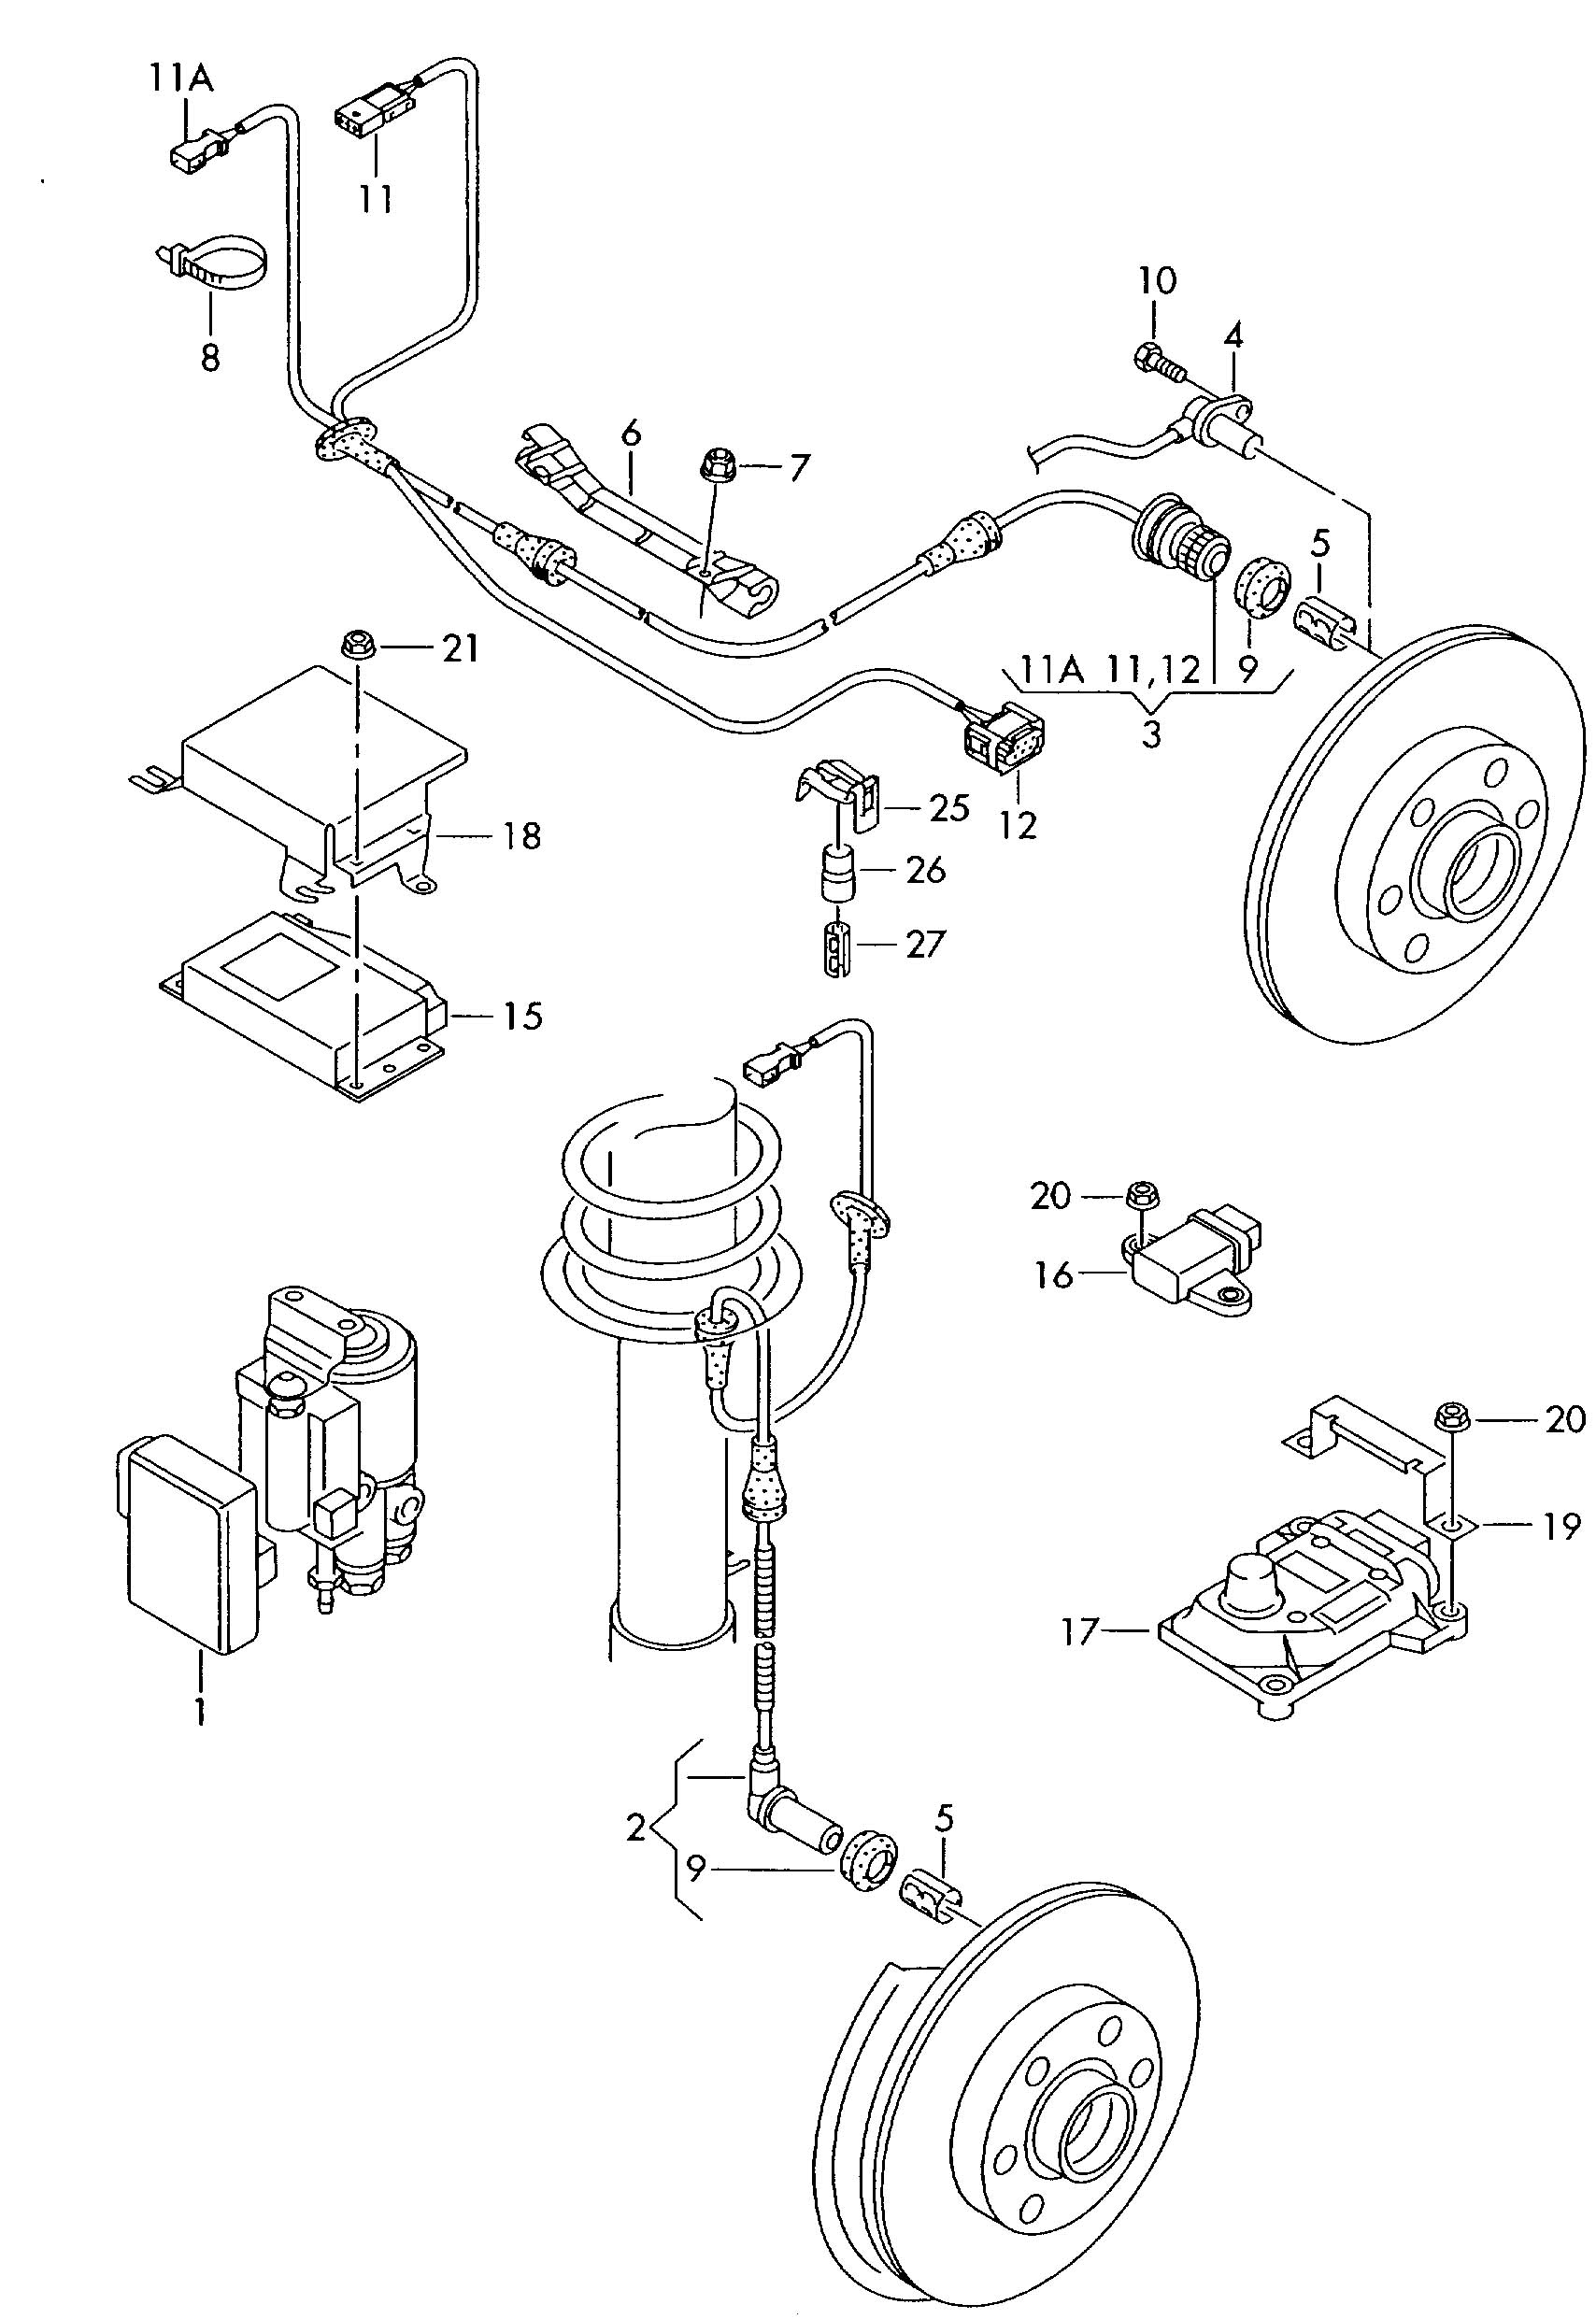 Vw Passat Abs Module Repair - Engine Diagram And Wiring Diagram